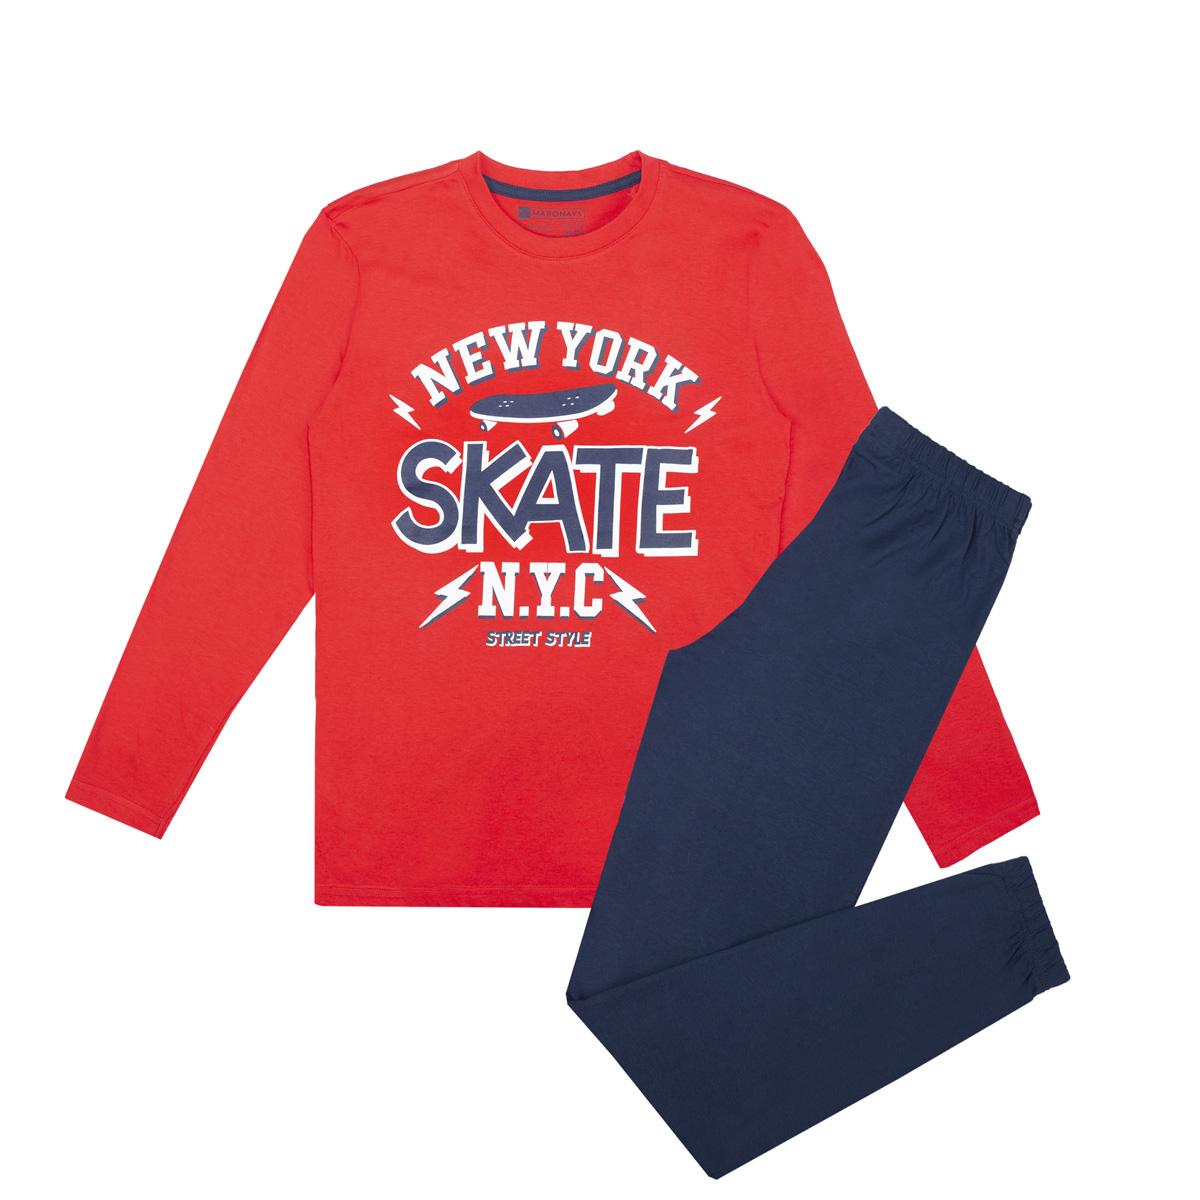 Fantovska pižama, rdeča